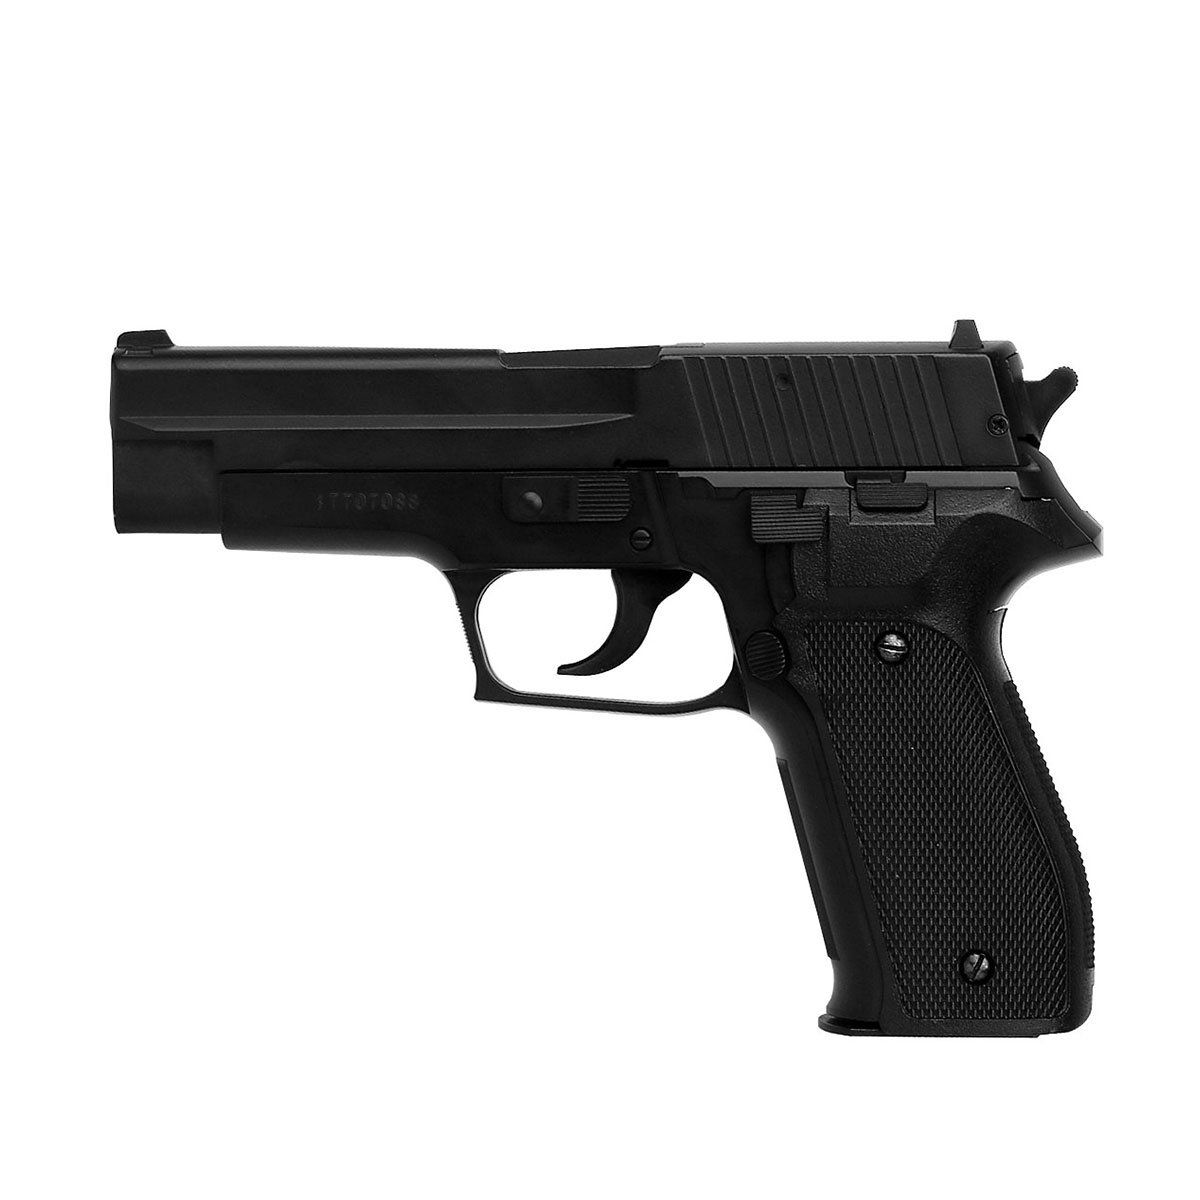 Pistola de Pressão KWC P226 Metal Spring 4,5mm com Maleta